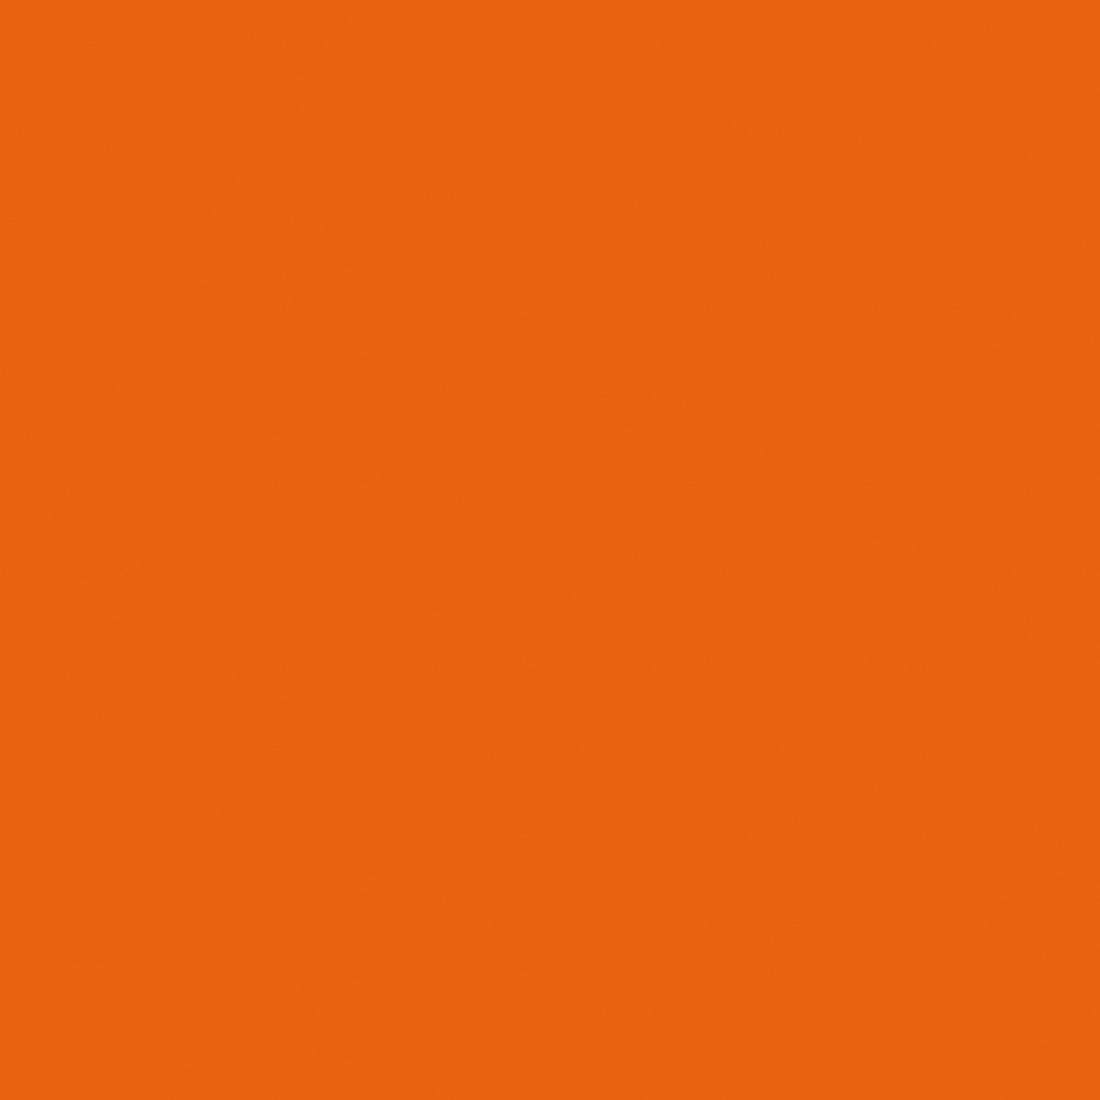 Dekor-orange